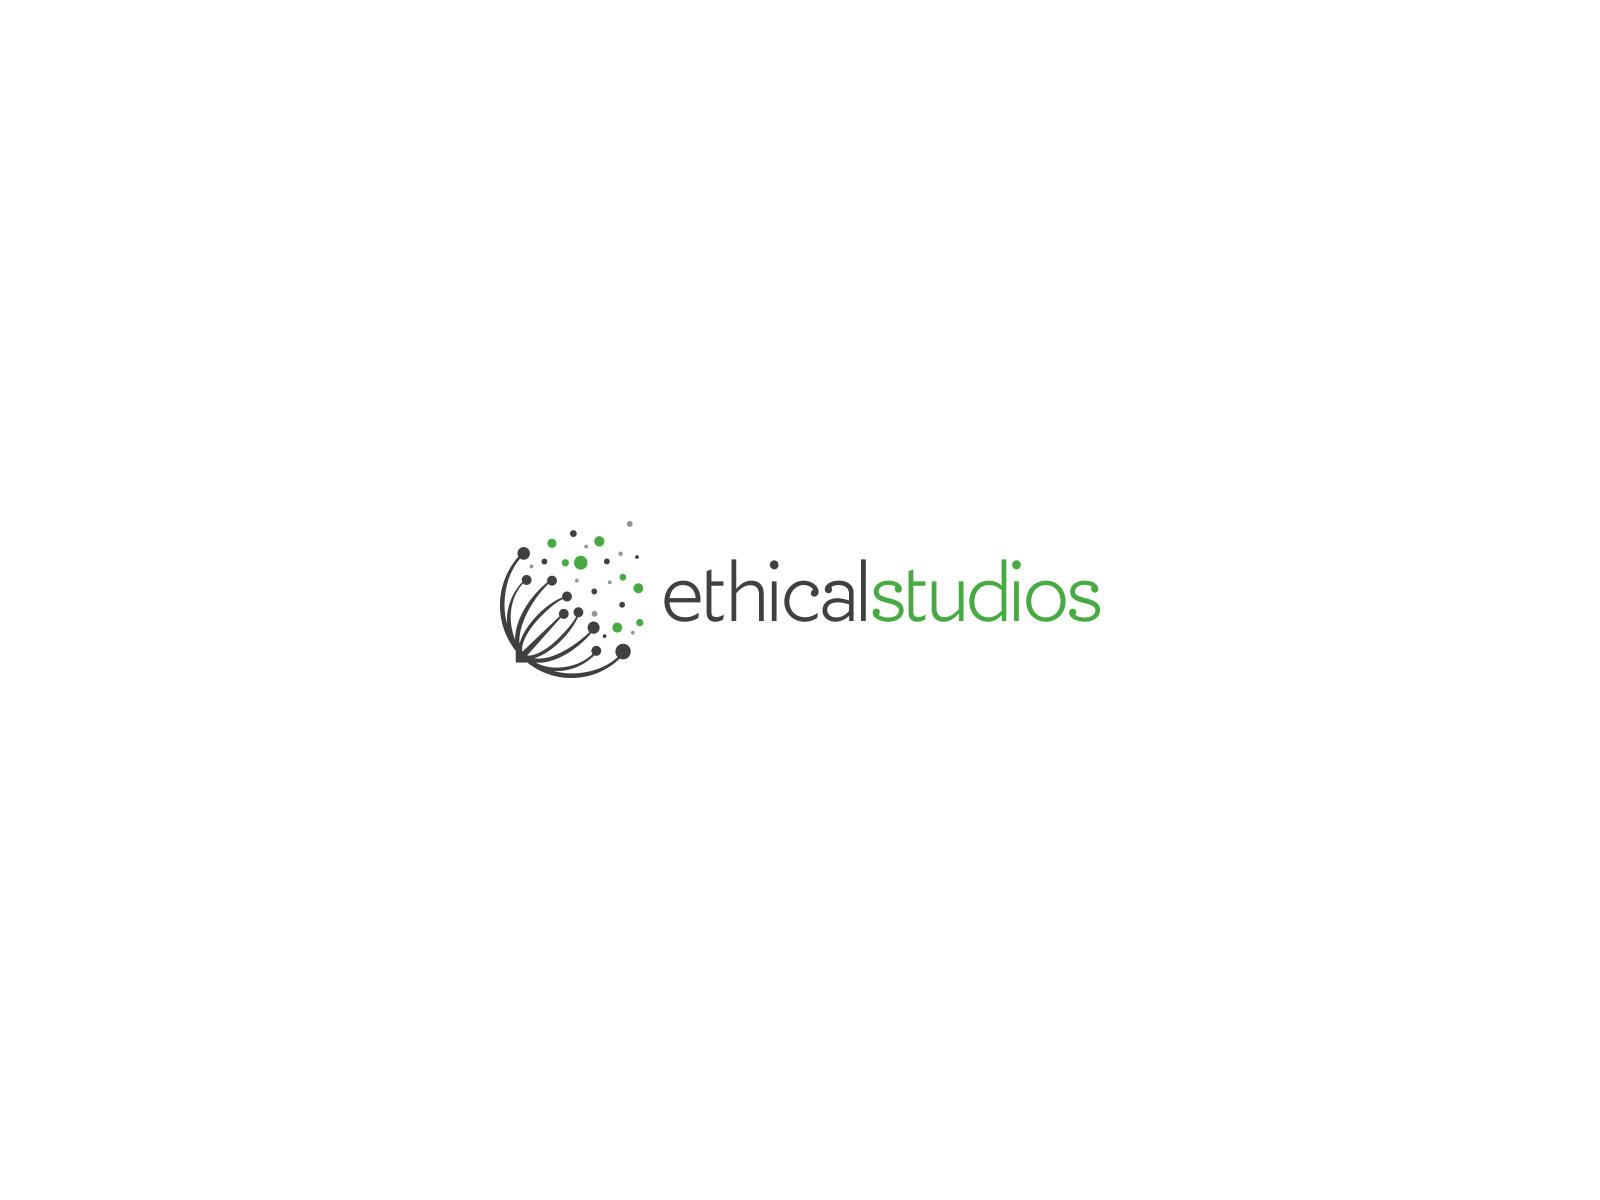 Ethical studios 2